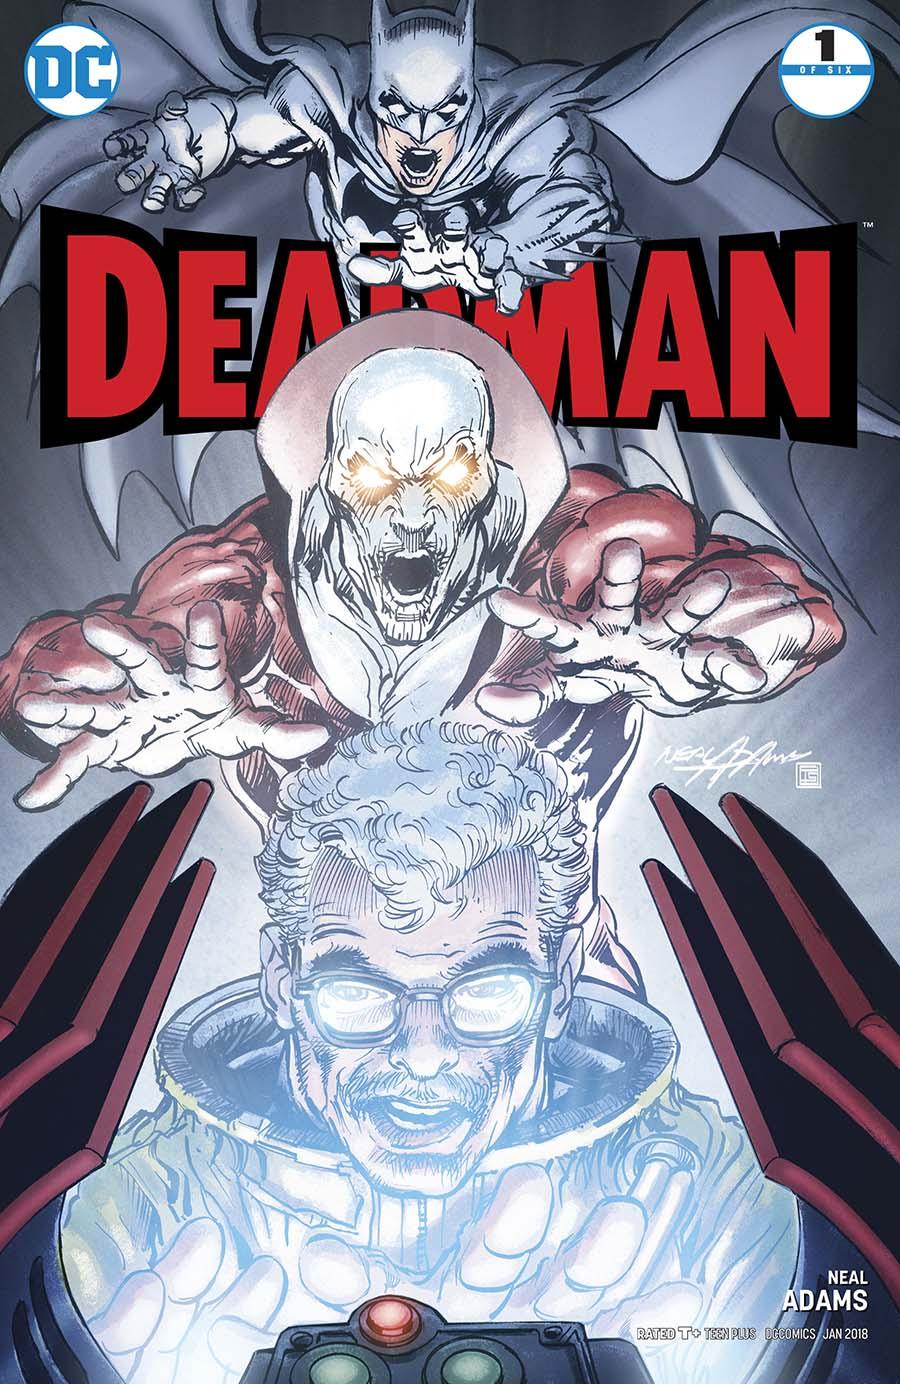 Deadman Vol 5 #1 Cover B Variant Neal Adams Standard Cover